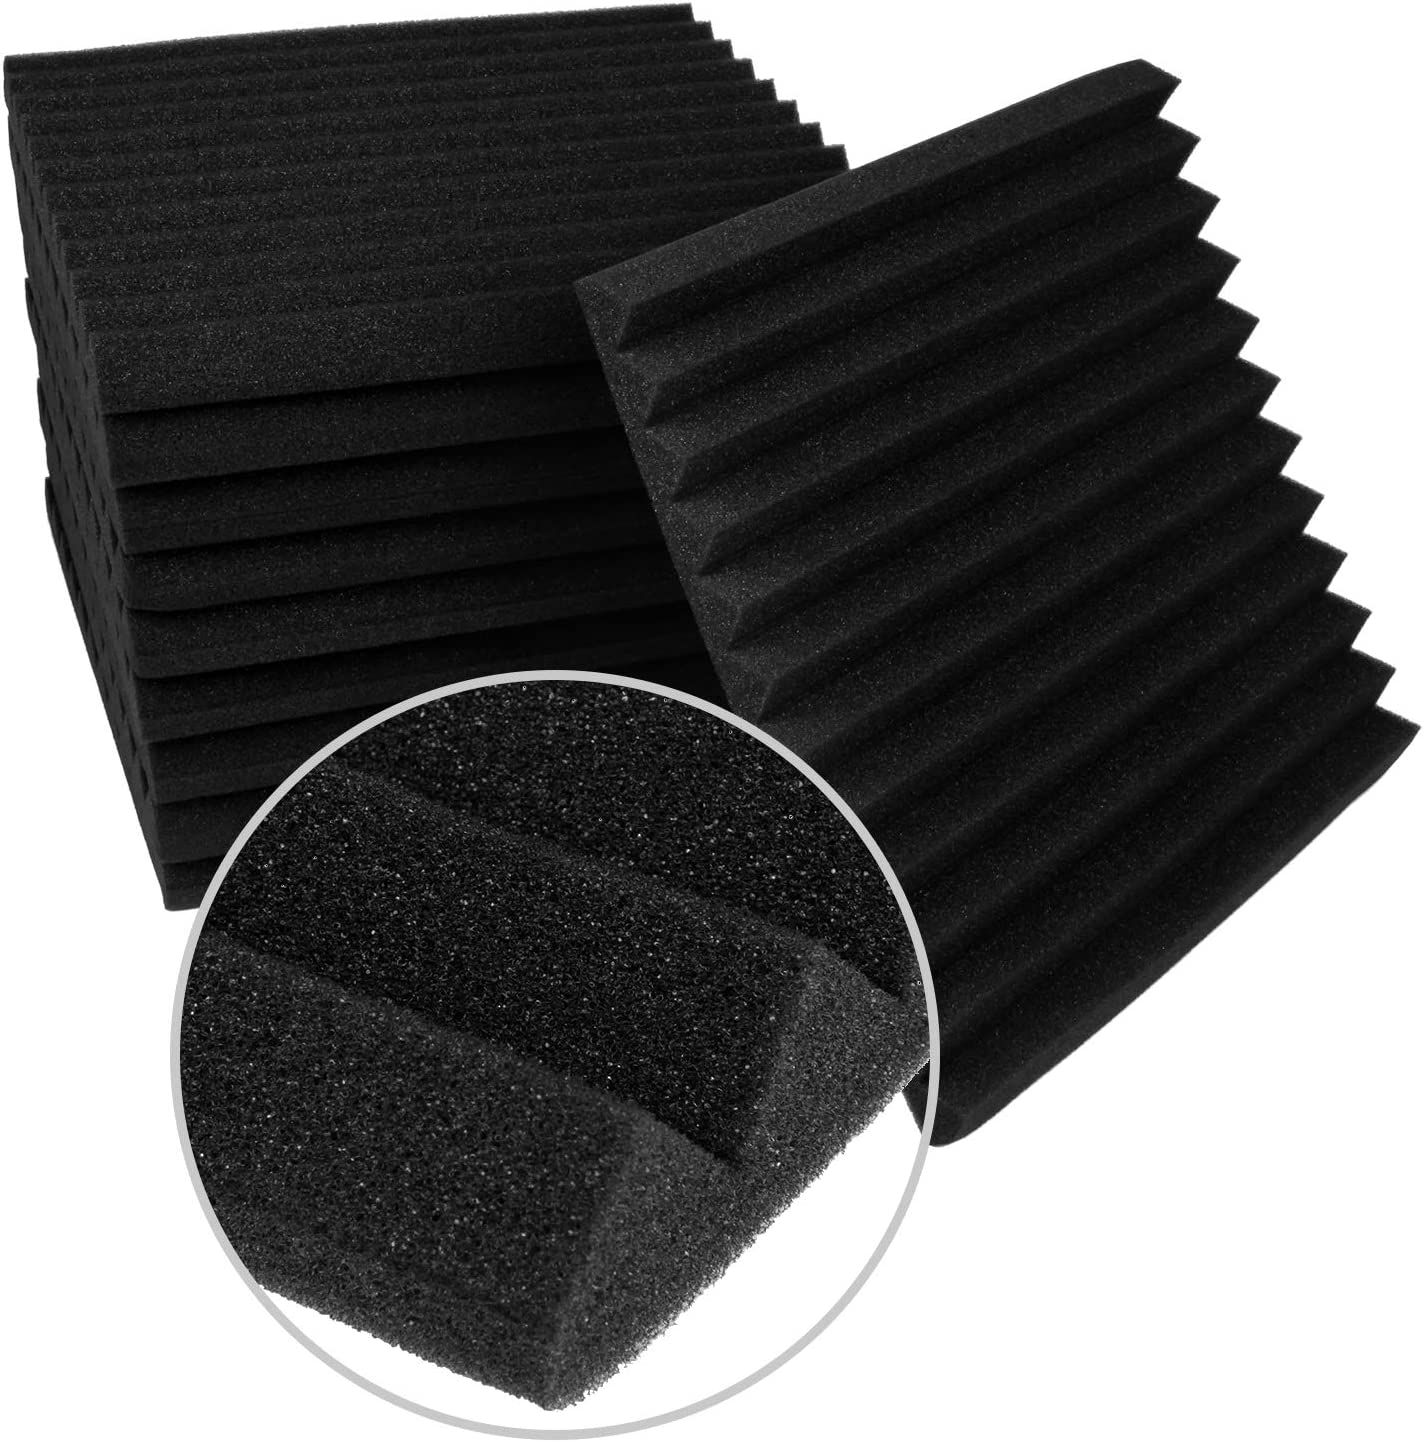 1 X 12 X 12 Acoustic Foam Sound Absorption Pyramid Studio Treatment Wall Panels Studio Wedge Tiles Vacuum Compression Packaging MOCREO 10 Pack Set Acoustic Foam Panels